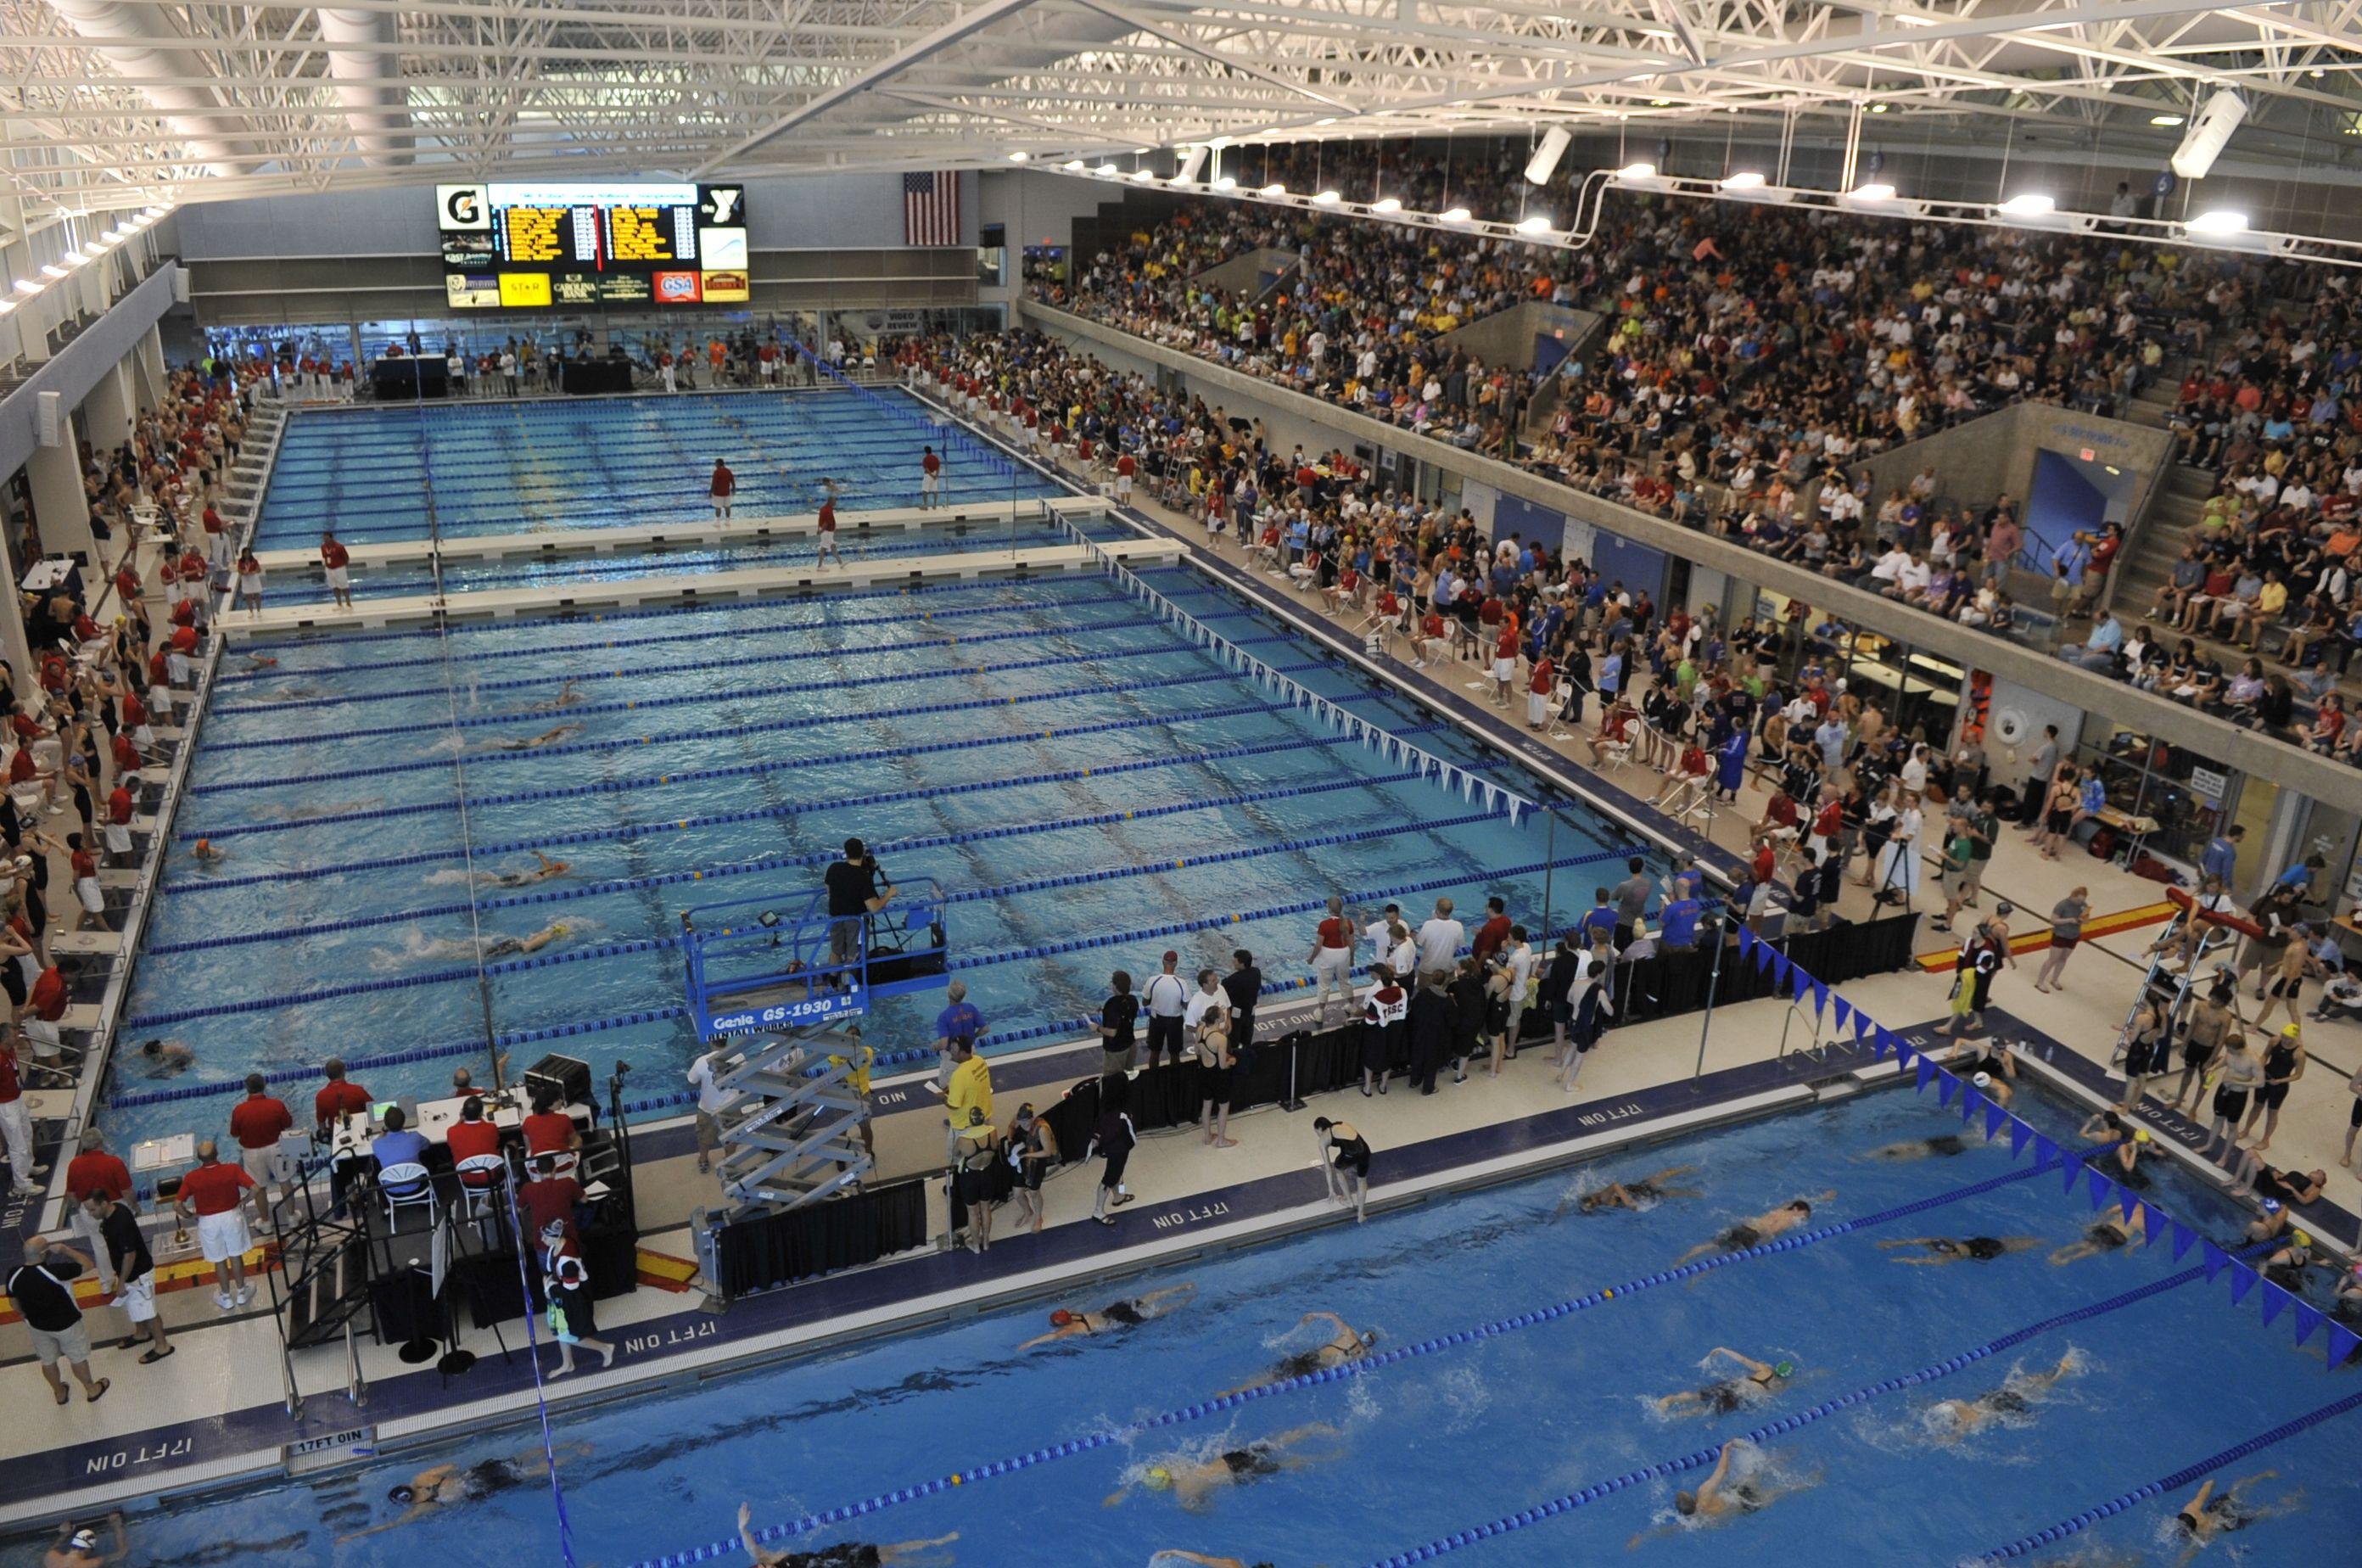 Pin On Sporting Events Around Greensboro